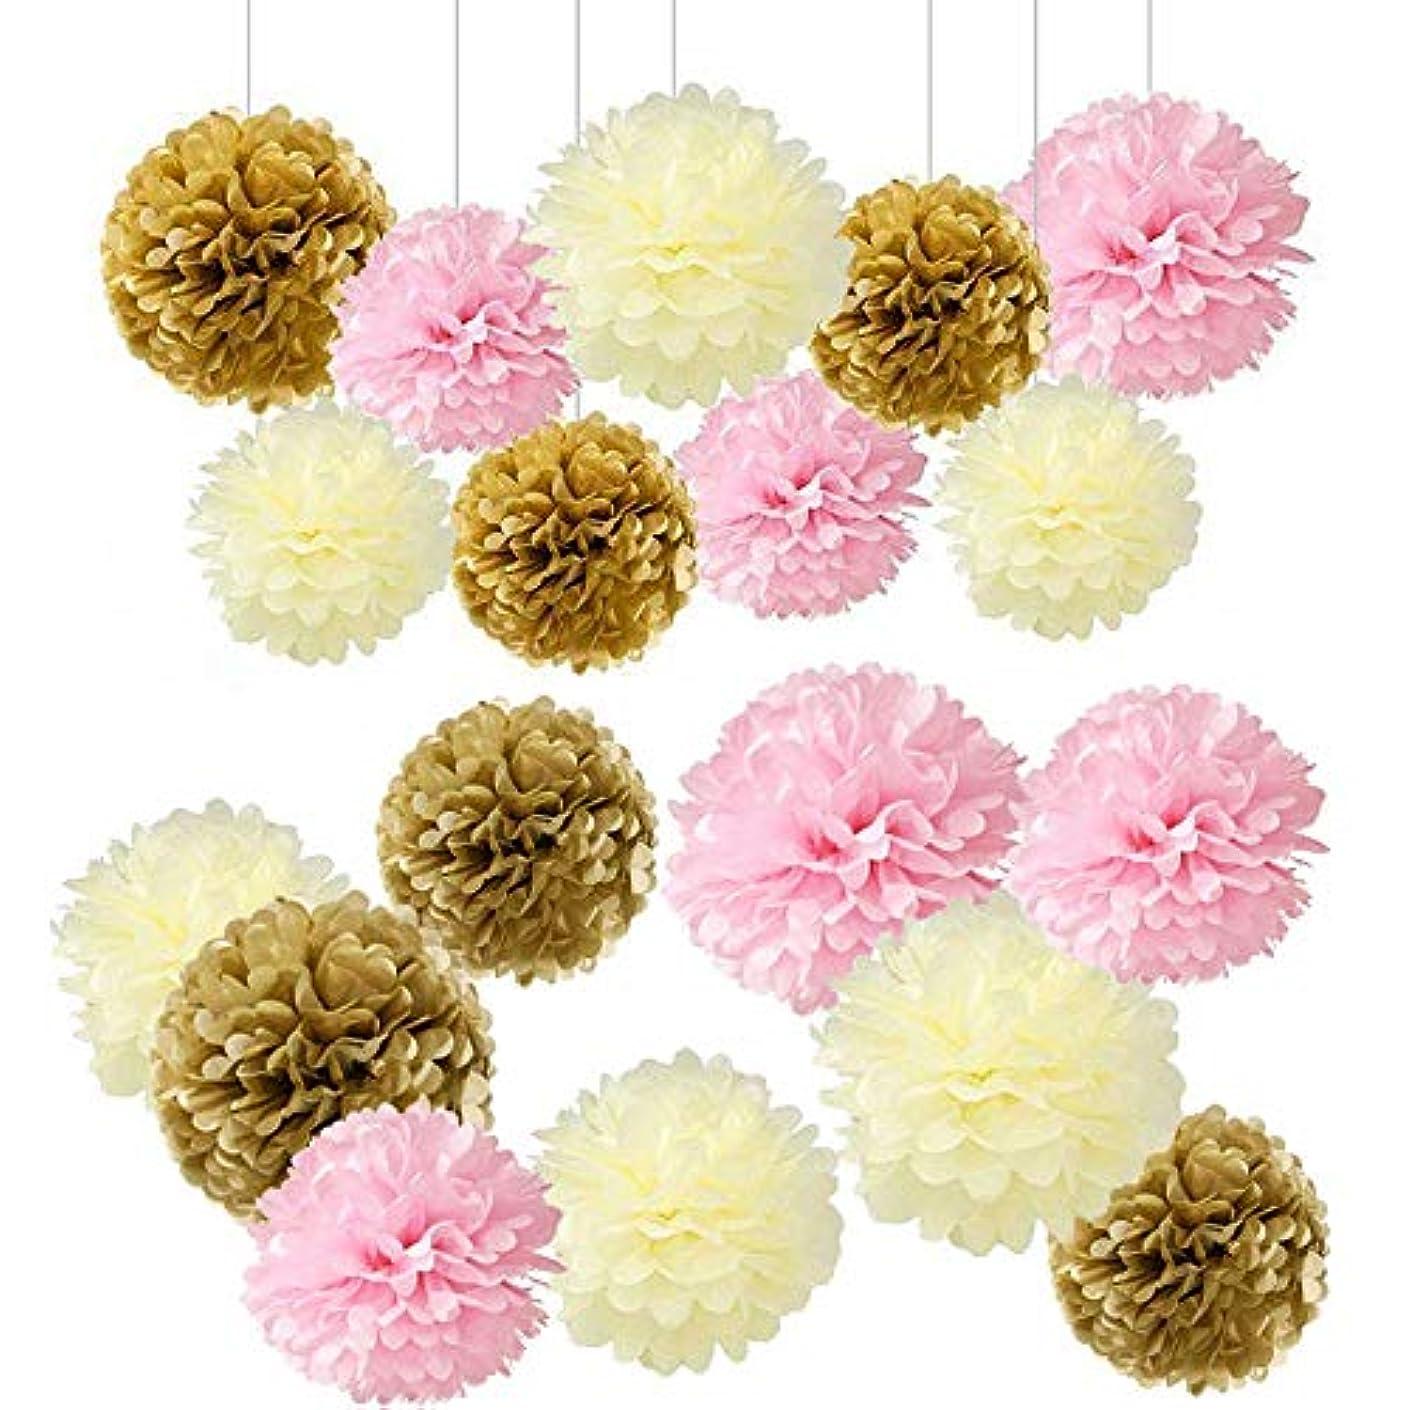 Tissue Paper Pom Pom Flowers Ball Party Decoration Kit for Birthday Wedding Celebration (Assorted 01)